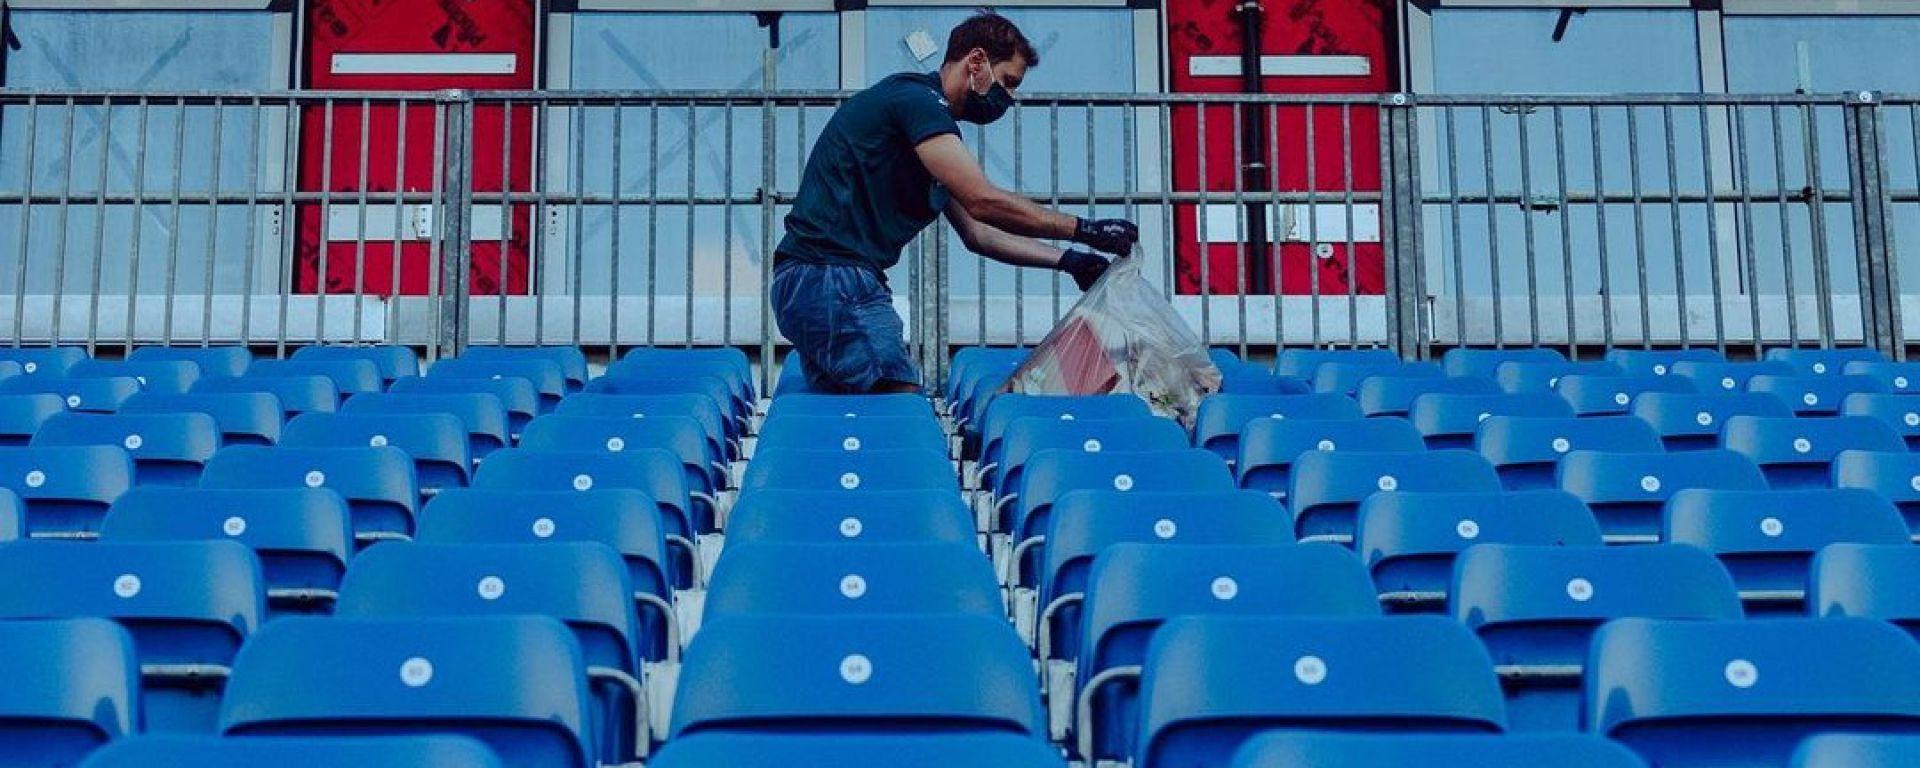 F1 GP Gran Bretagna 2021, Silverstone: Sebastian Vettel (Aston Martin) raccoglie rifiuti in tribuna